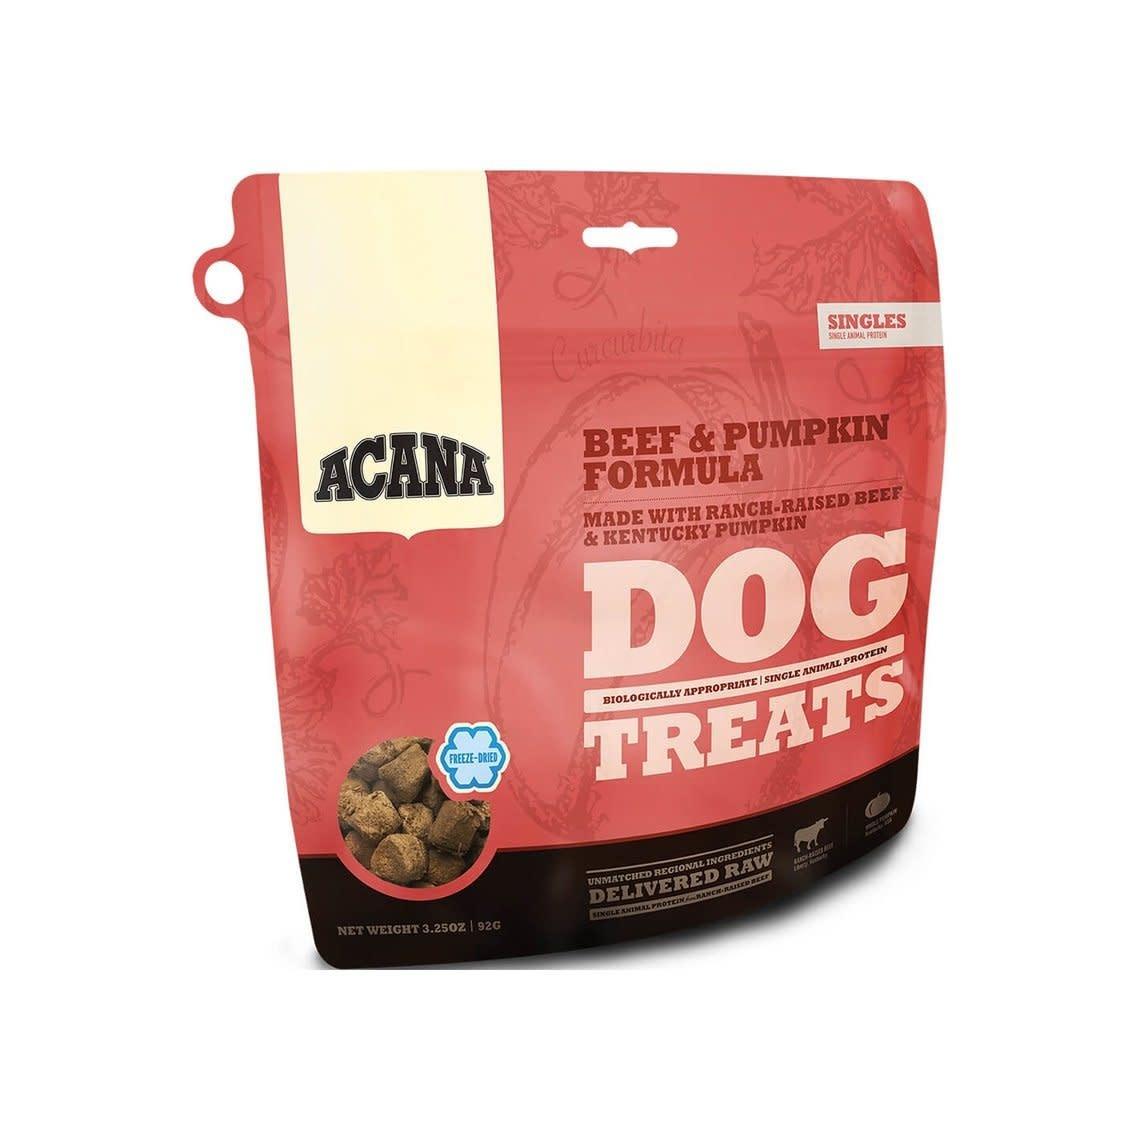 Acana (Champion) Acana Beef & Pumpkin Treats 1.25 oz